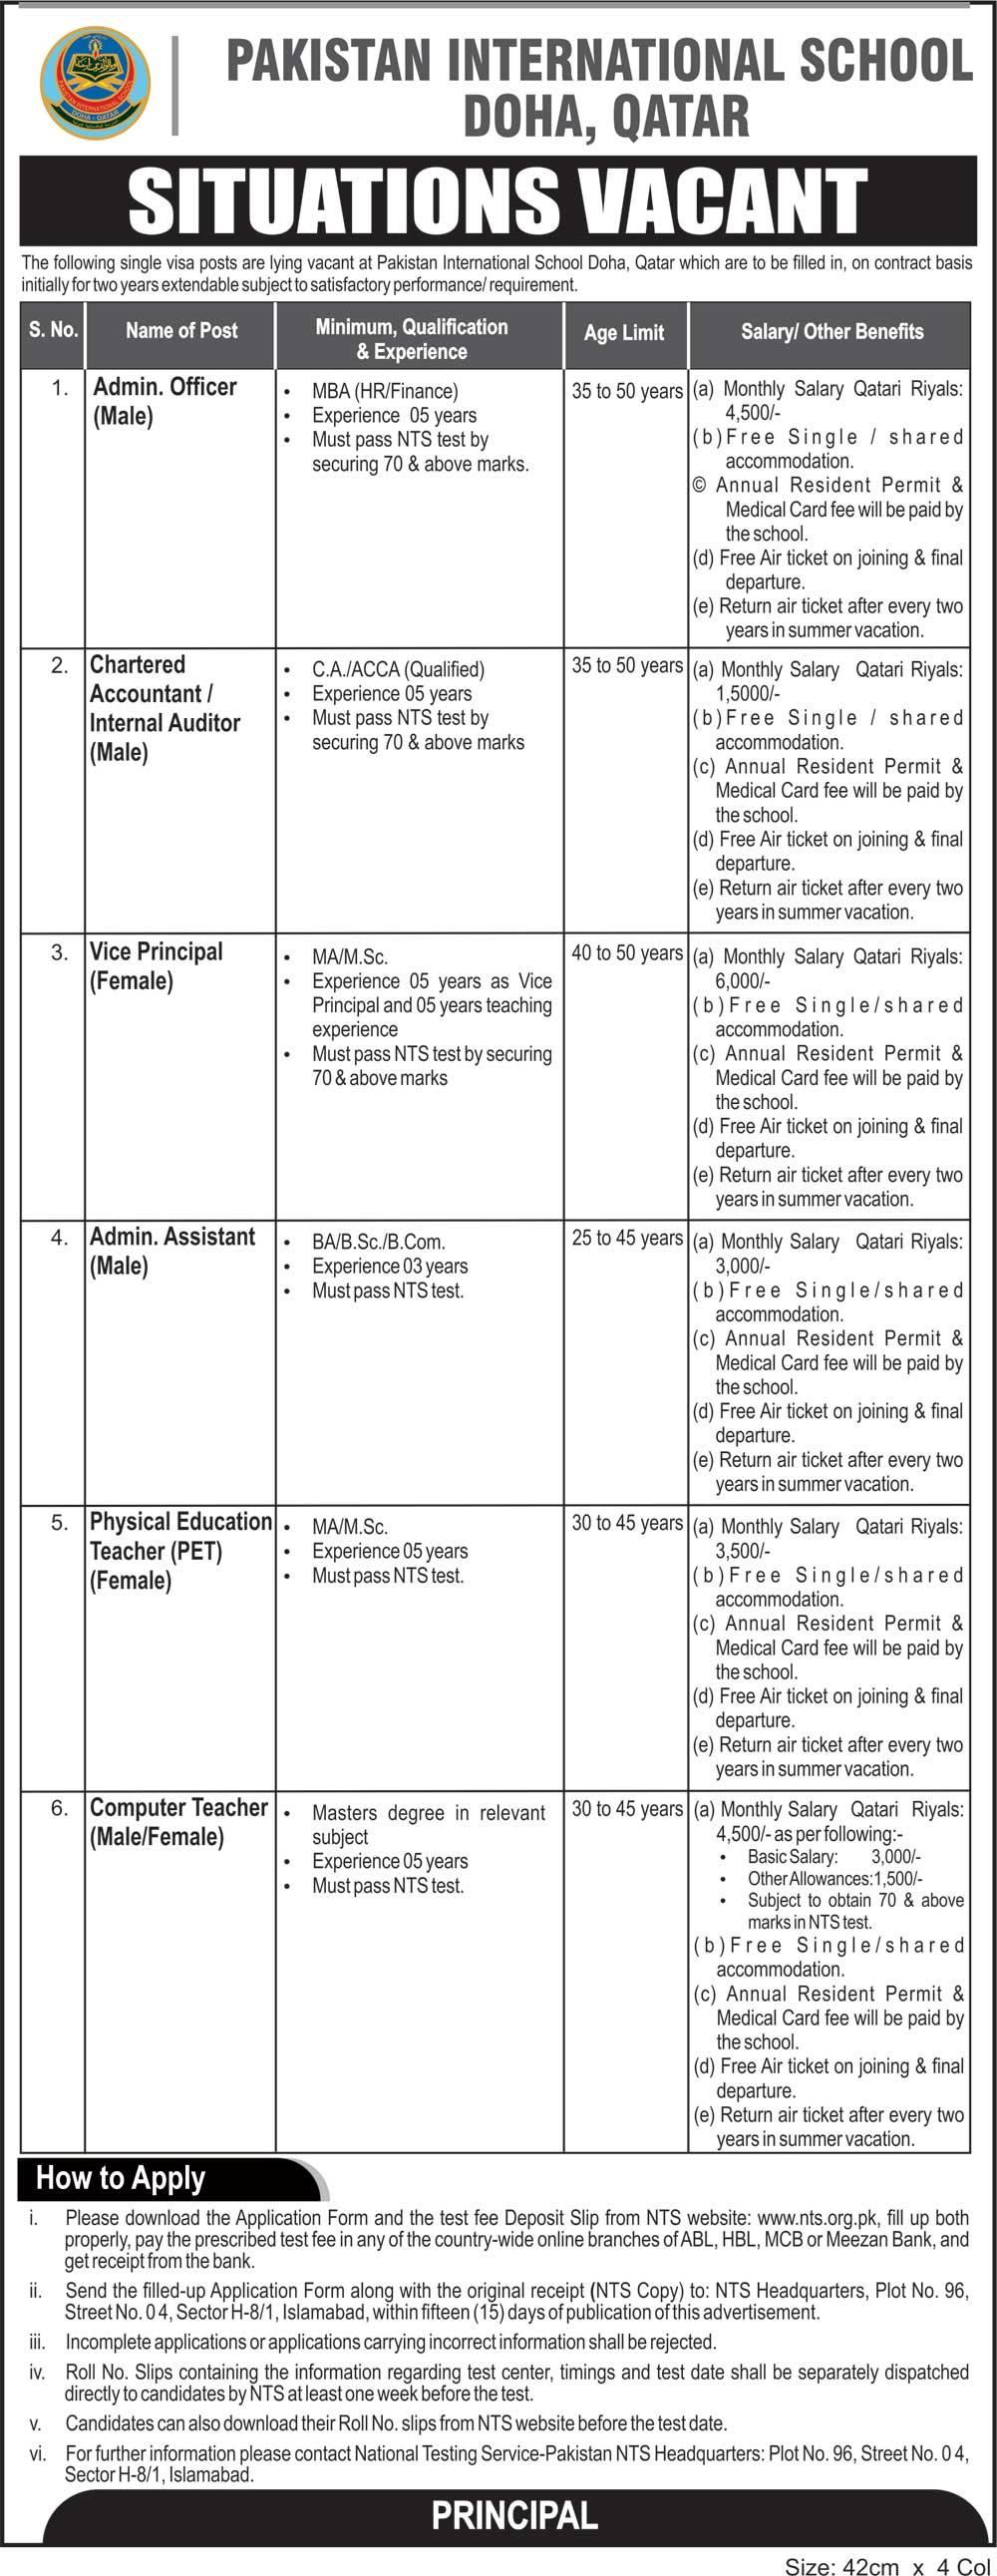 Qatar Medical Forms on clip art,